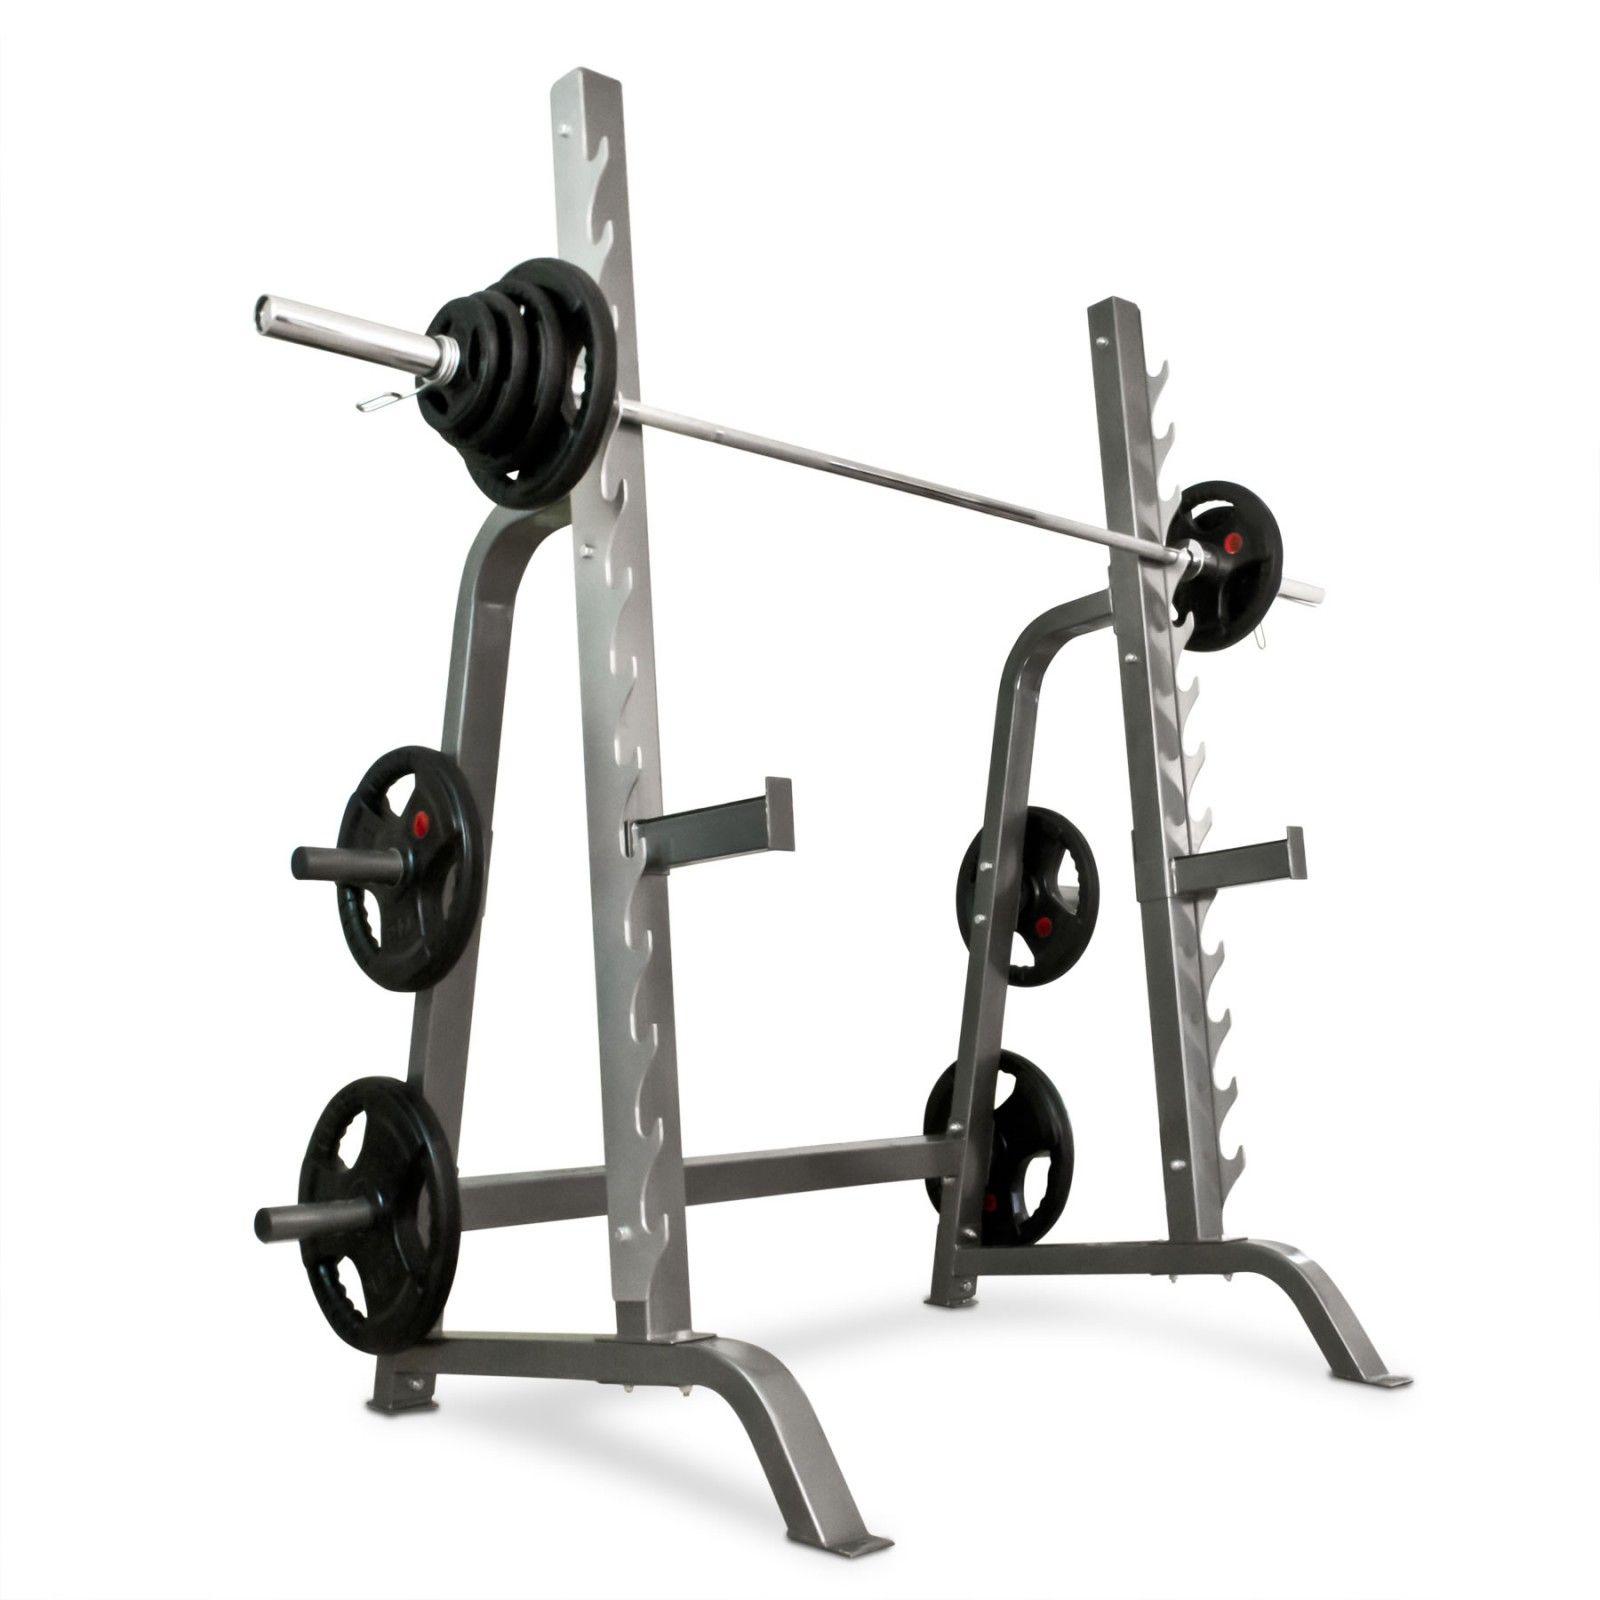 Bodymax Cf480 Heavy Duty Multi Press Walk In Squat Rack Squat Rack Cheap Weight Bench Squats